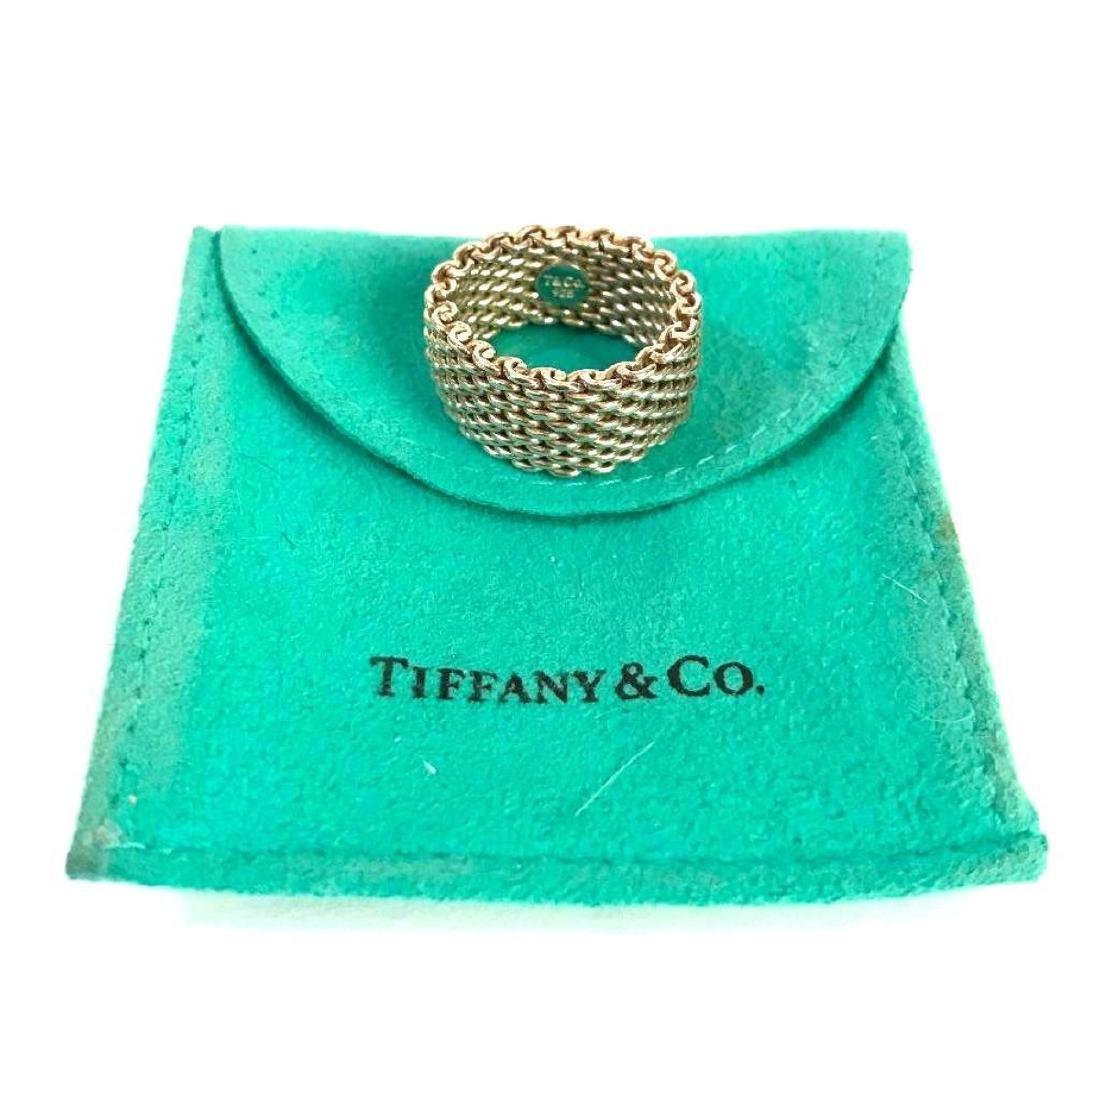 fe5418f11d988 Tiffany & Co Somerset Sterling Mesh Ring - Feb 23, 2019 ...